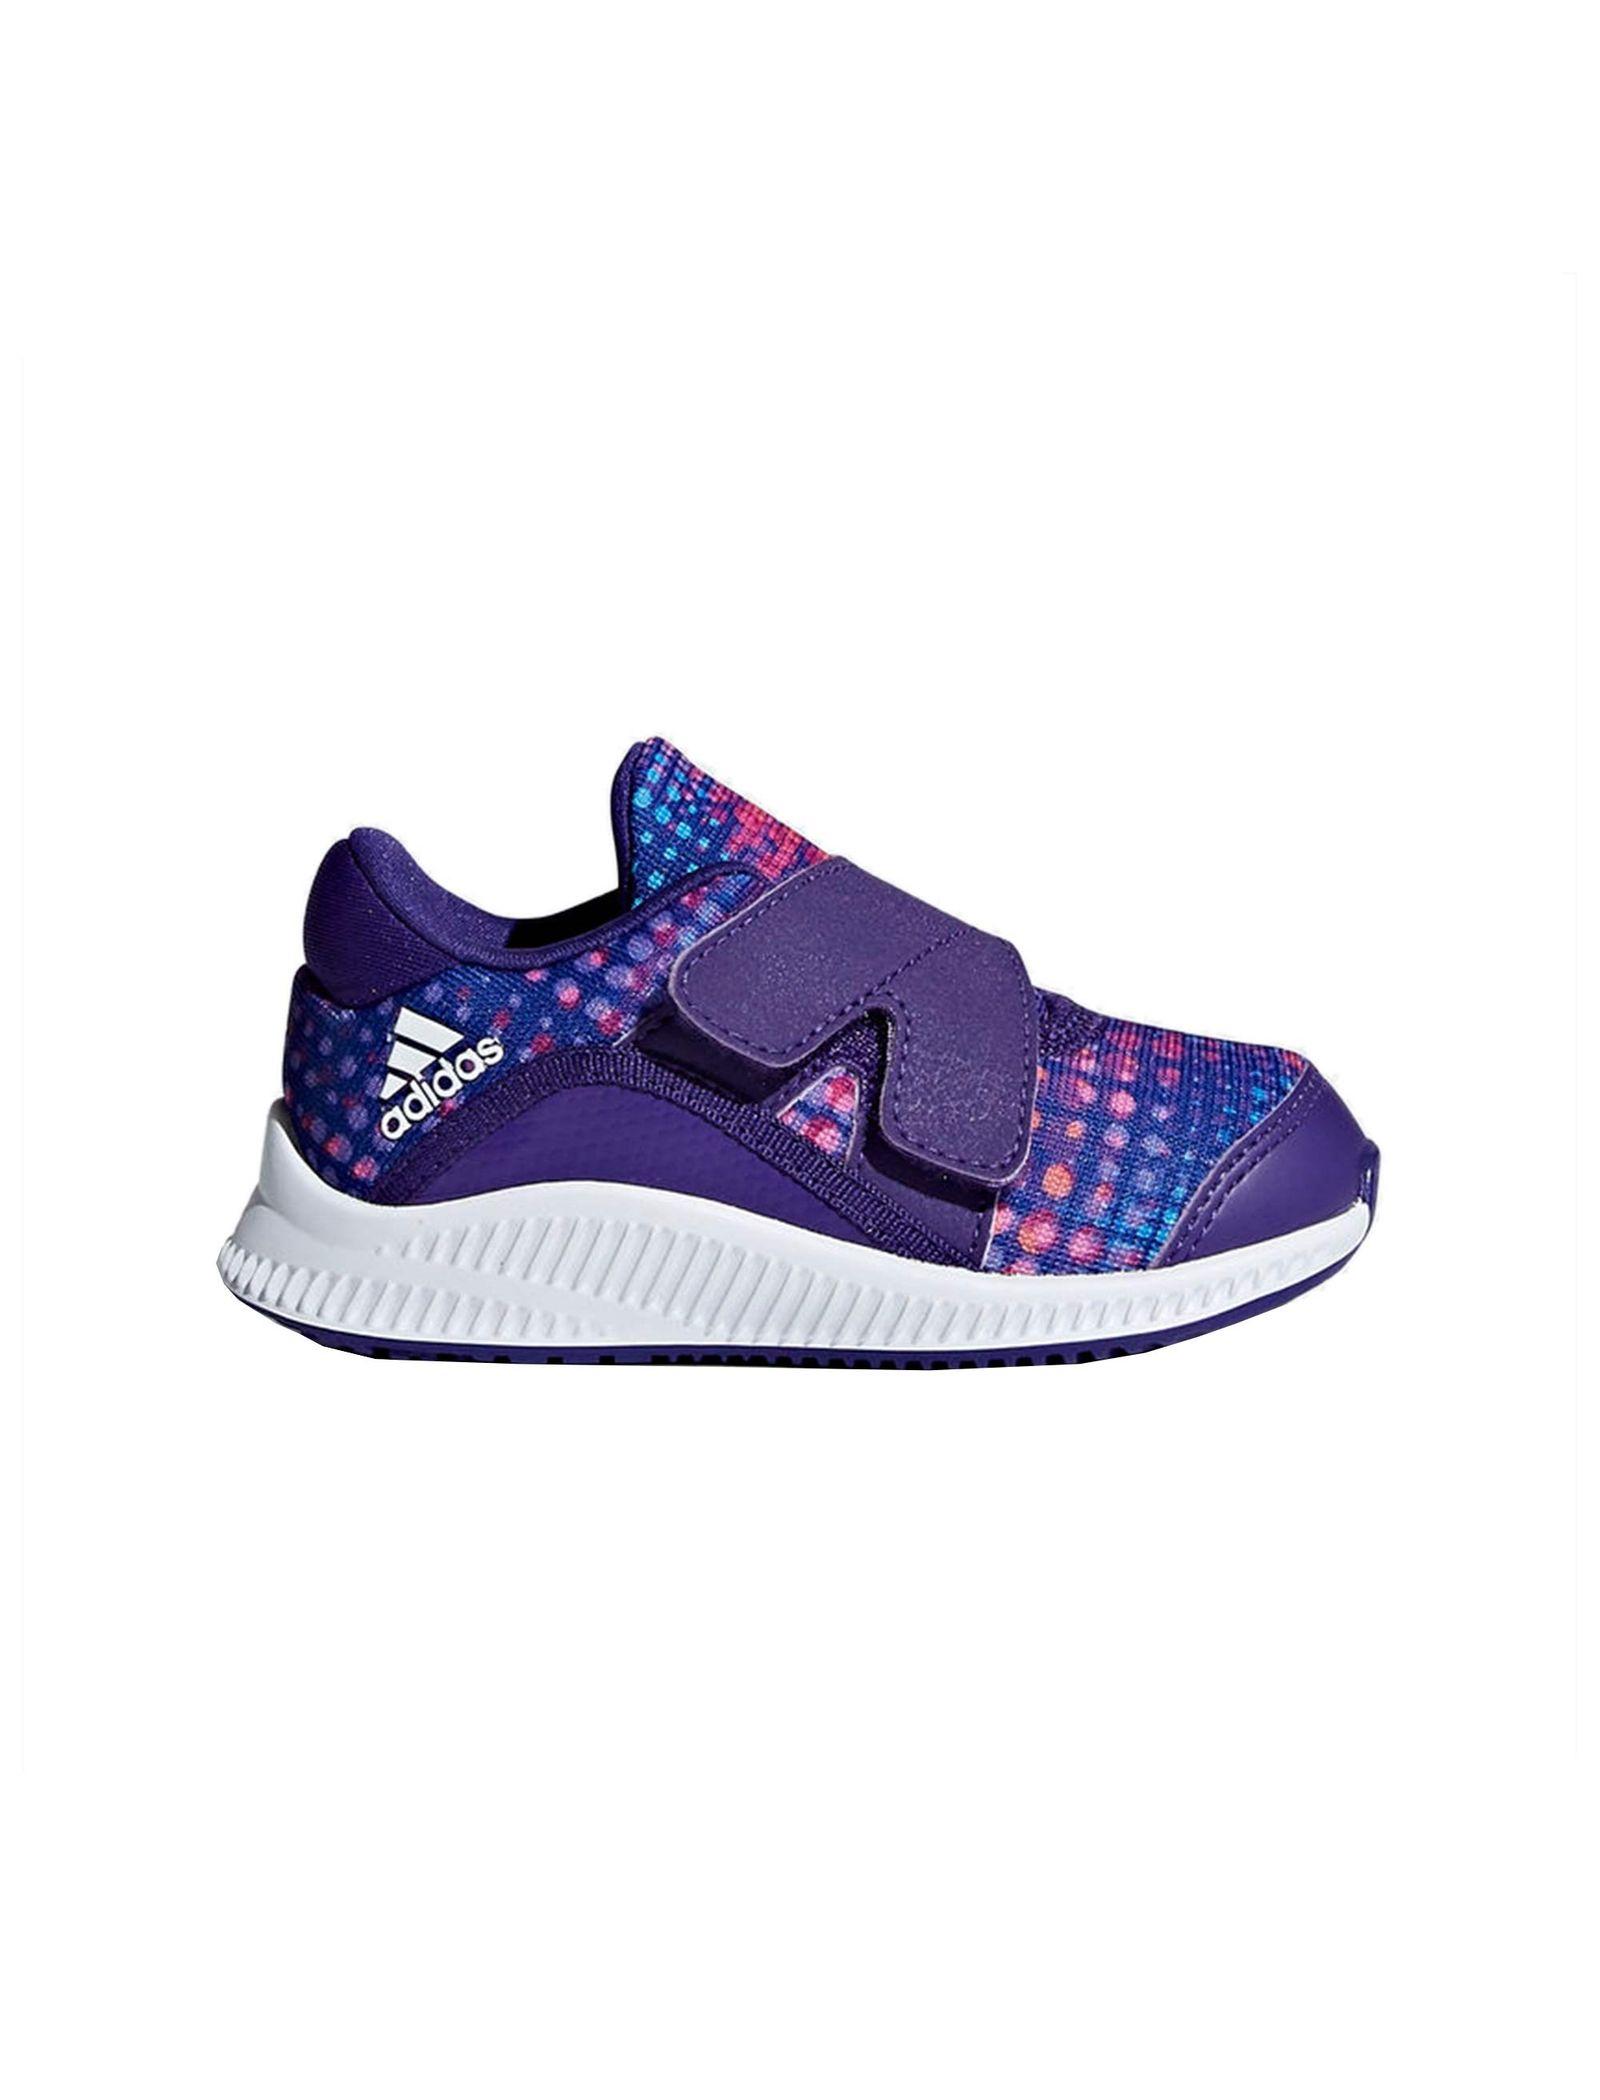 کفش دویدن بندی بچه گانه Fortarun X - آدیداس -  - 1